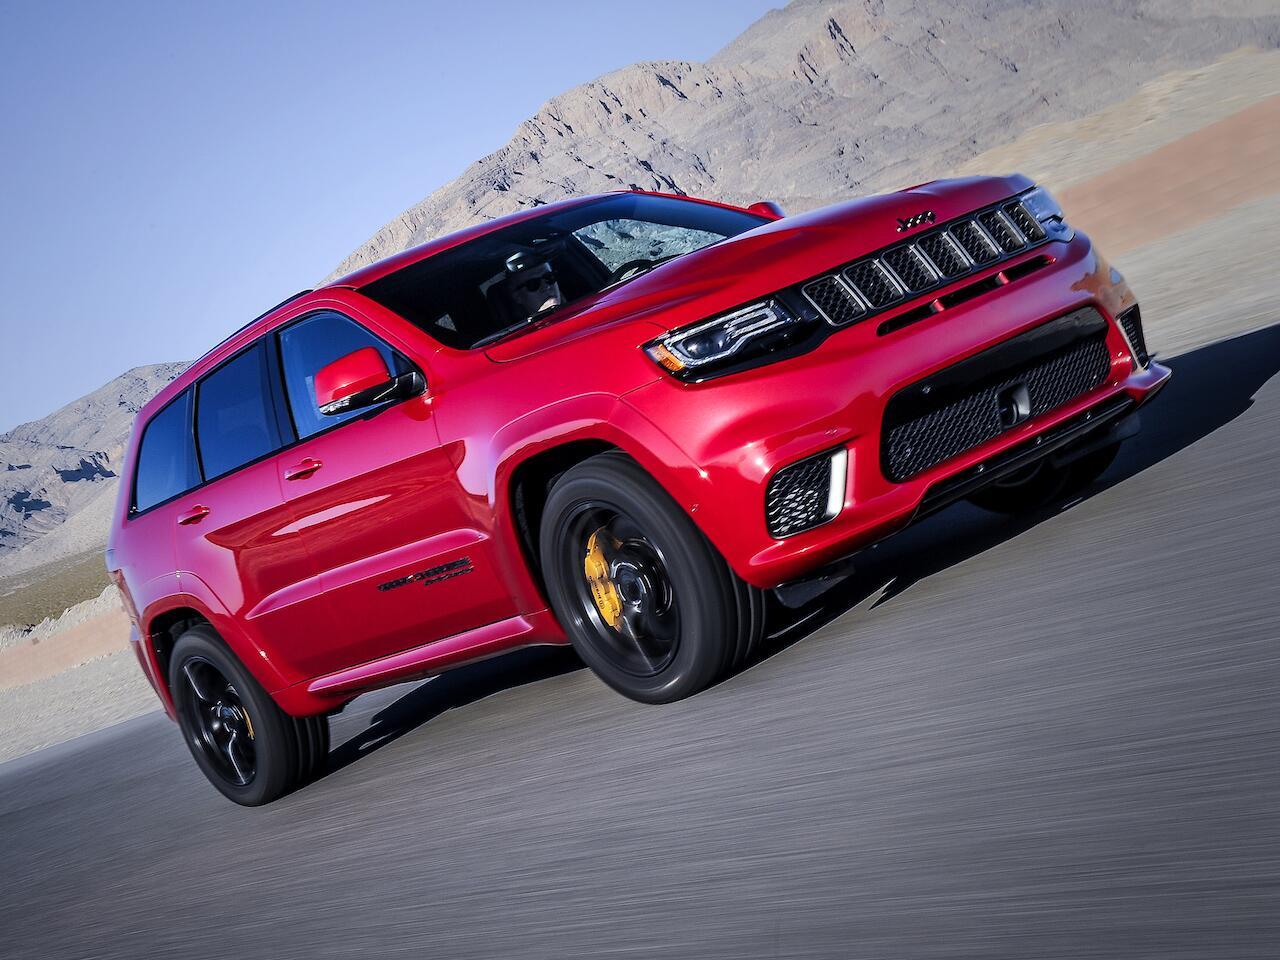 Bild zu Platz 2: Jeep Grand Cherokee